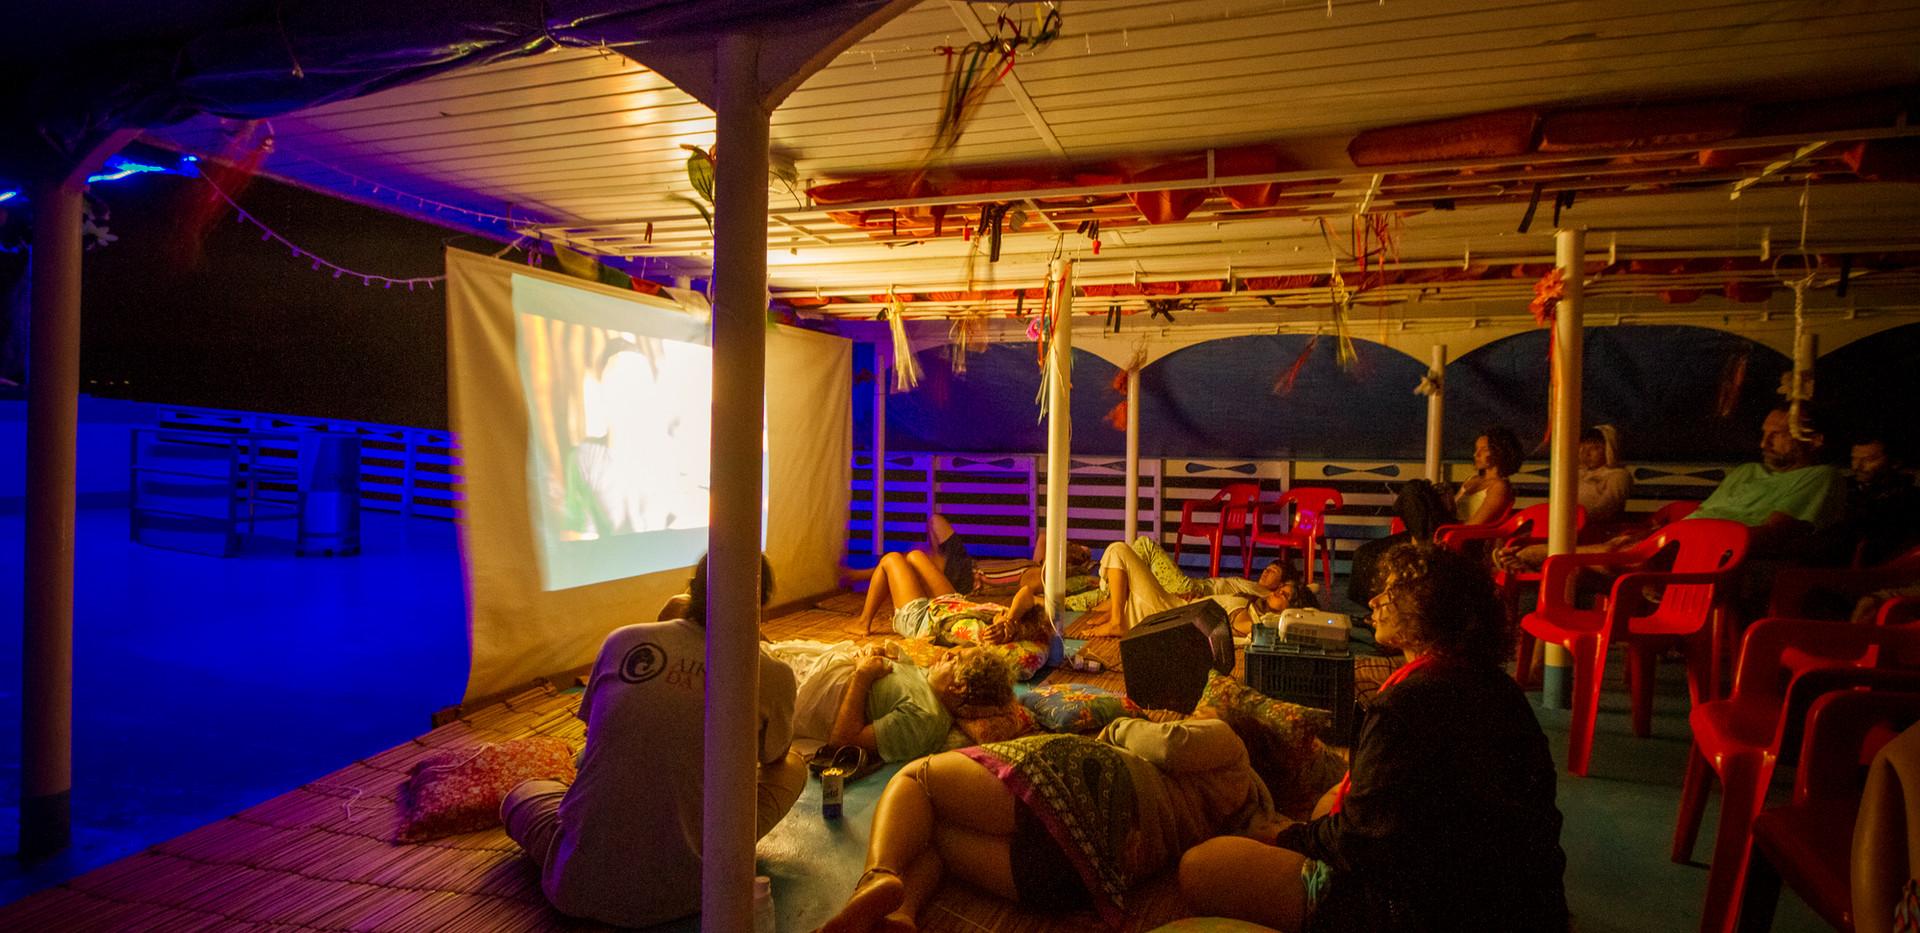 Cinema no barco. Foto: Guilherme Castoldi